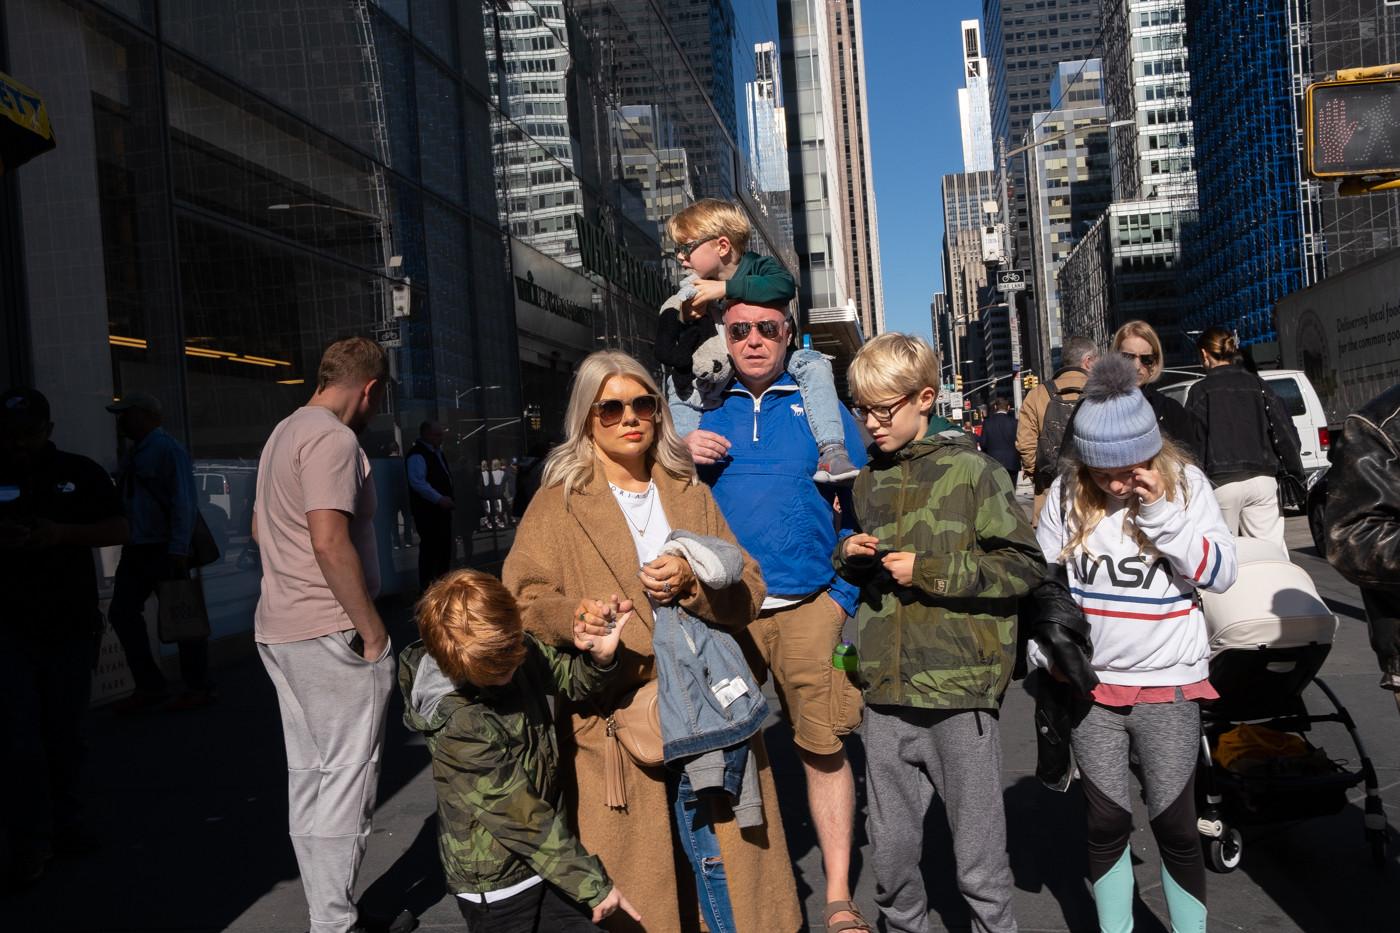 NYC_8_Family Crossing.jpg